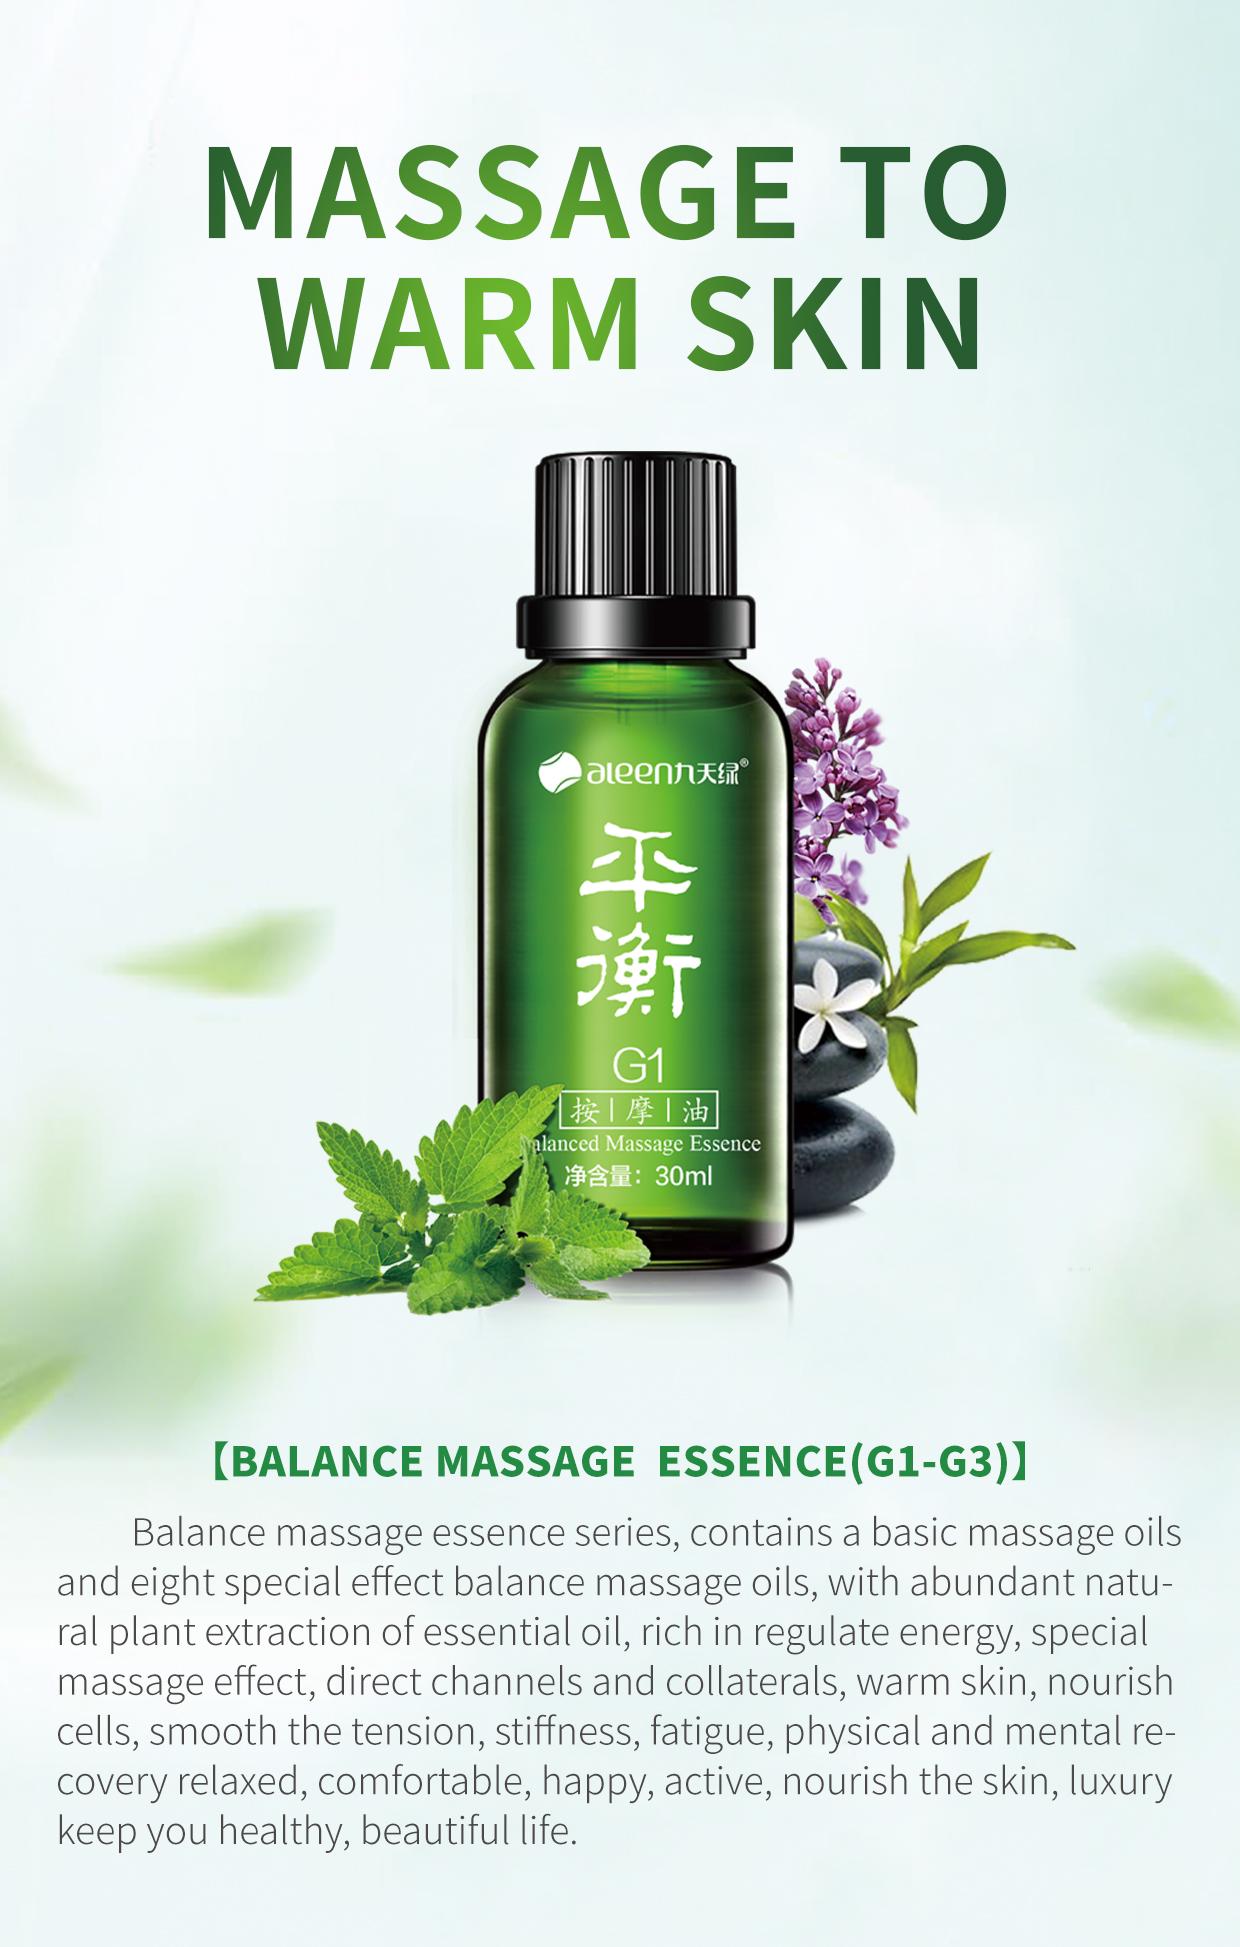 Balance Massage Essence